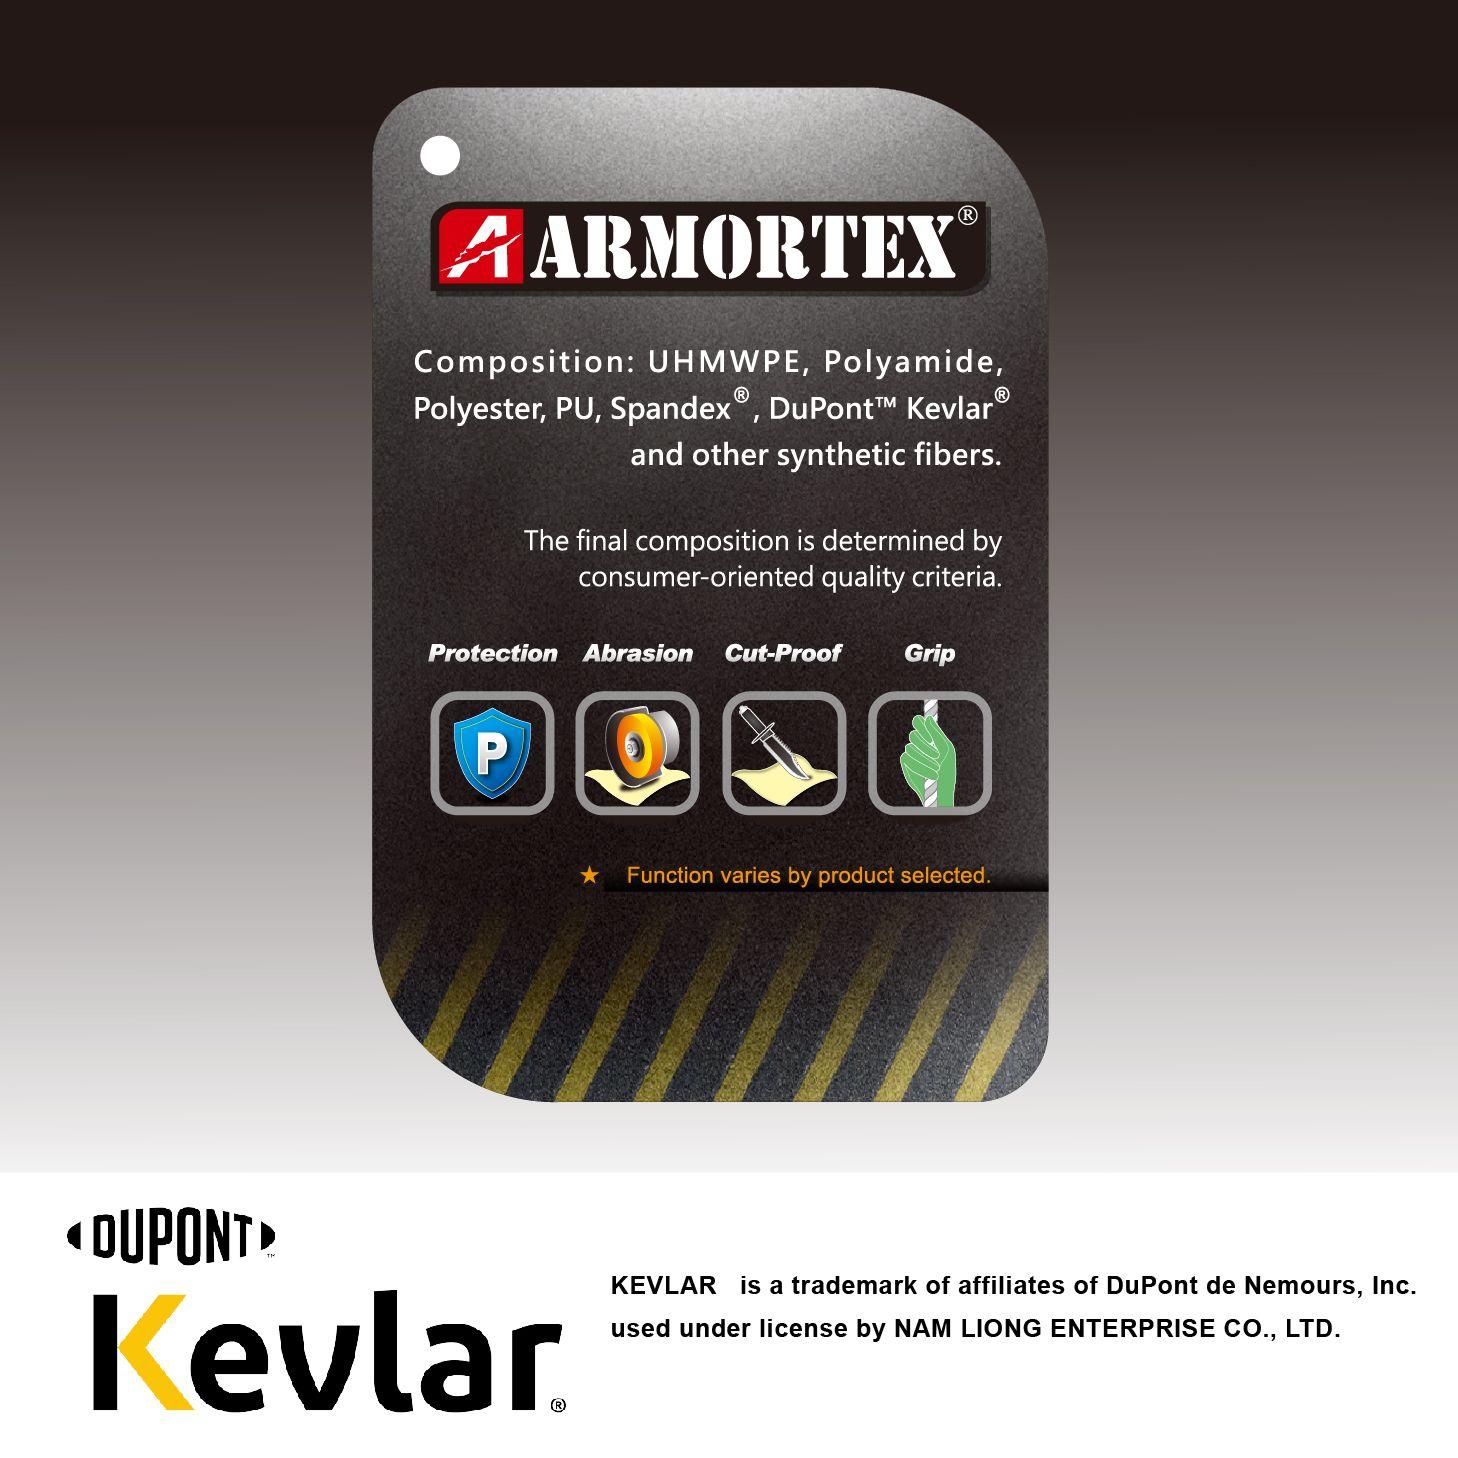 Kevlar®는 EI du Pont de Nemours & Company (DuPont ™)의 등록 상표입니다. ARMORTEX®는NAM LIONG ENTERPRISE CO., LTD.